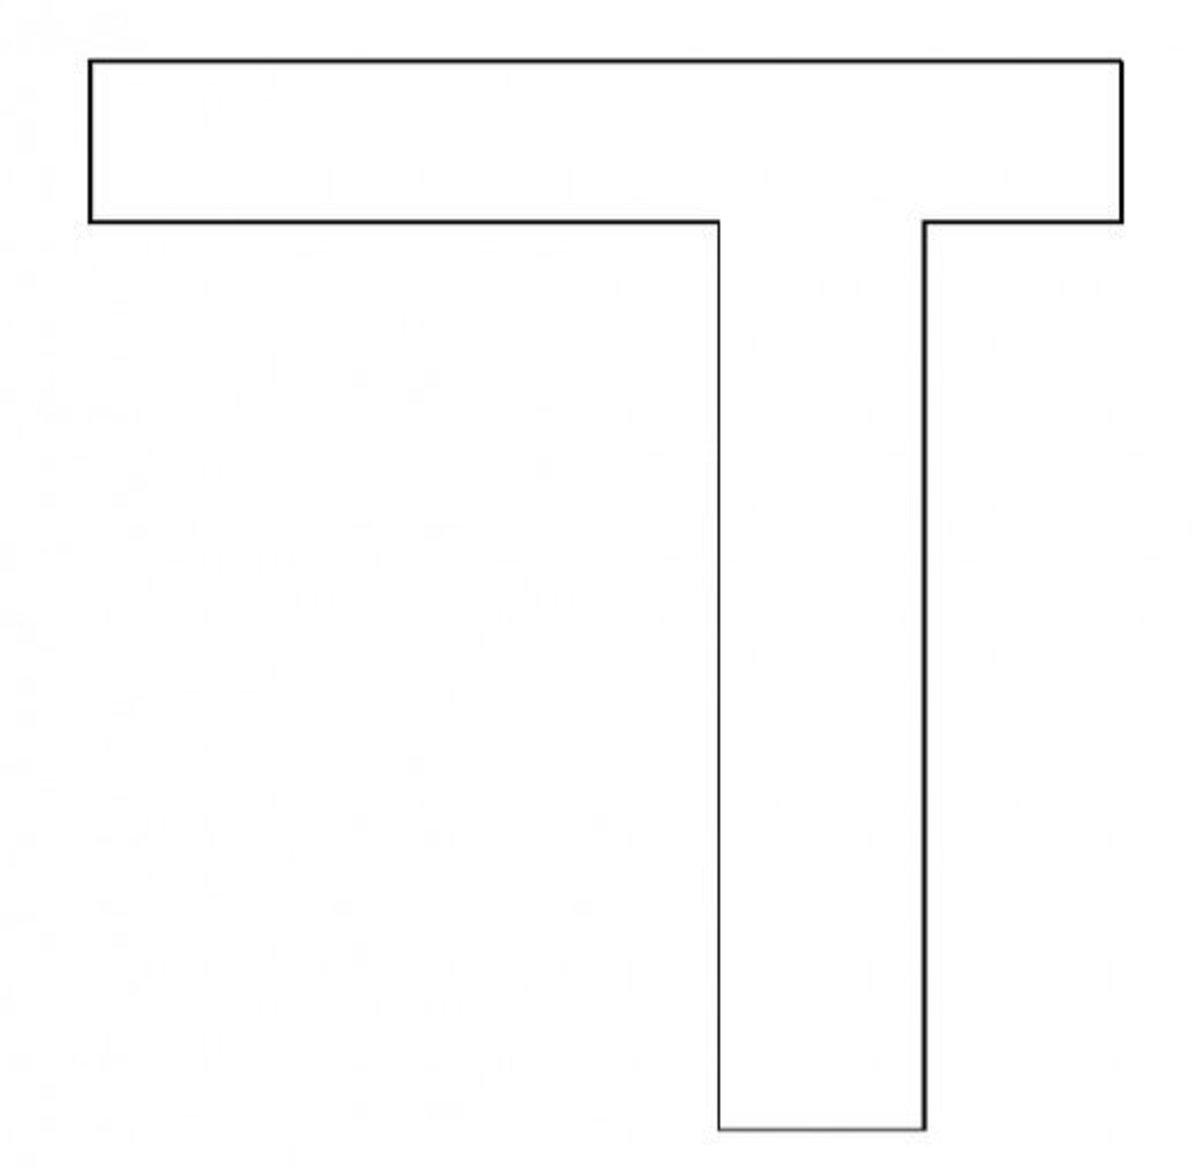 Hebrew Letter Dalet Coloring Page - דף צביעה אוֹת דלת